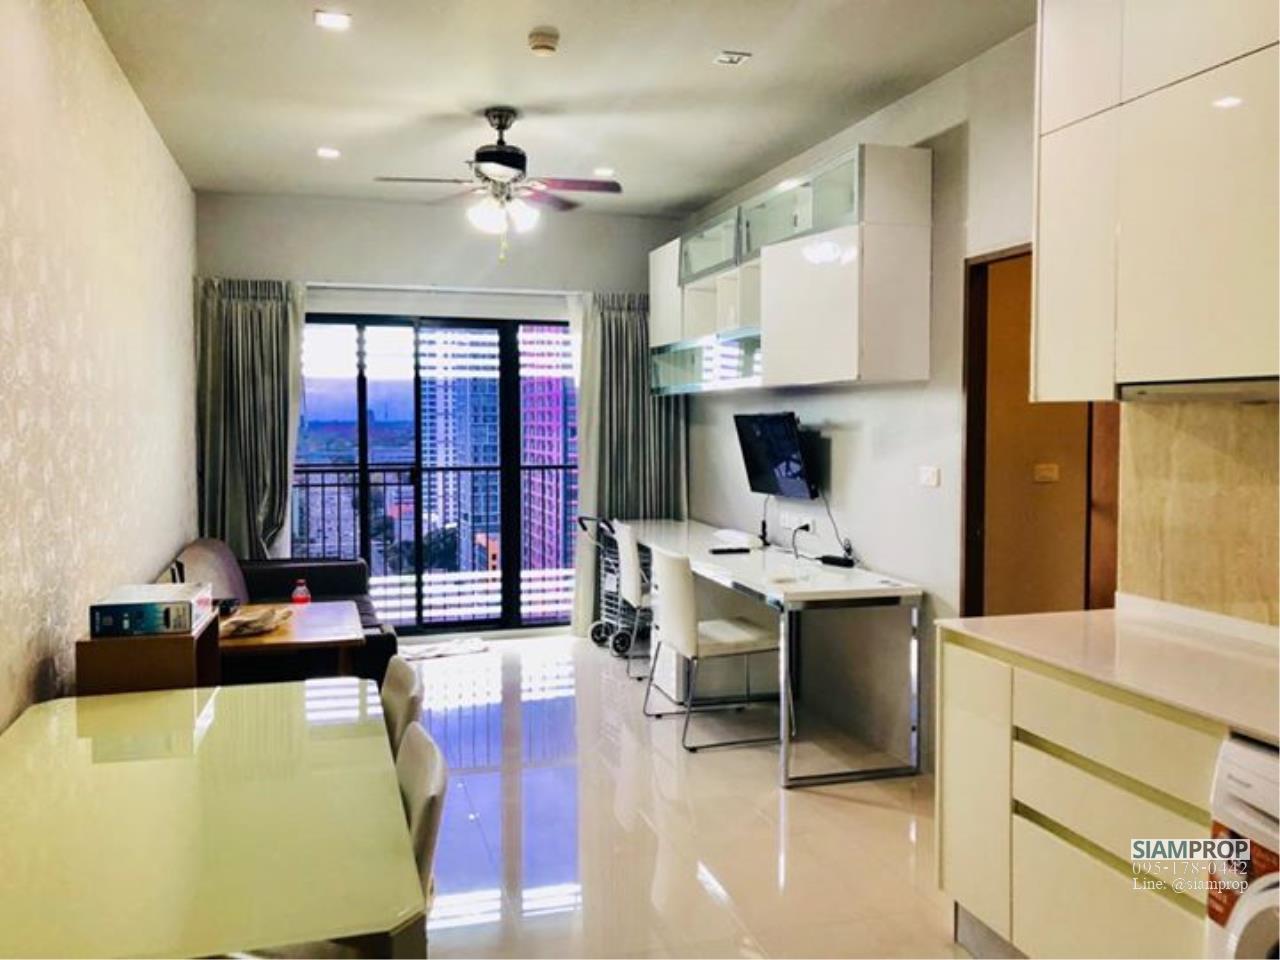 Siam Prop Agency's Sell / Rent Noble Revent Condo near BTS Phaya Thai 10